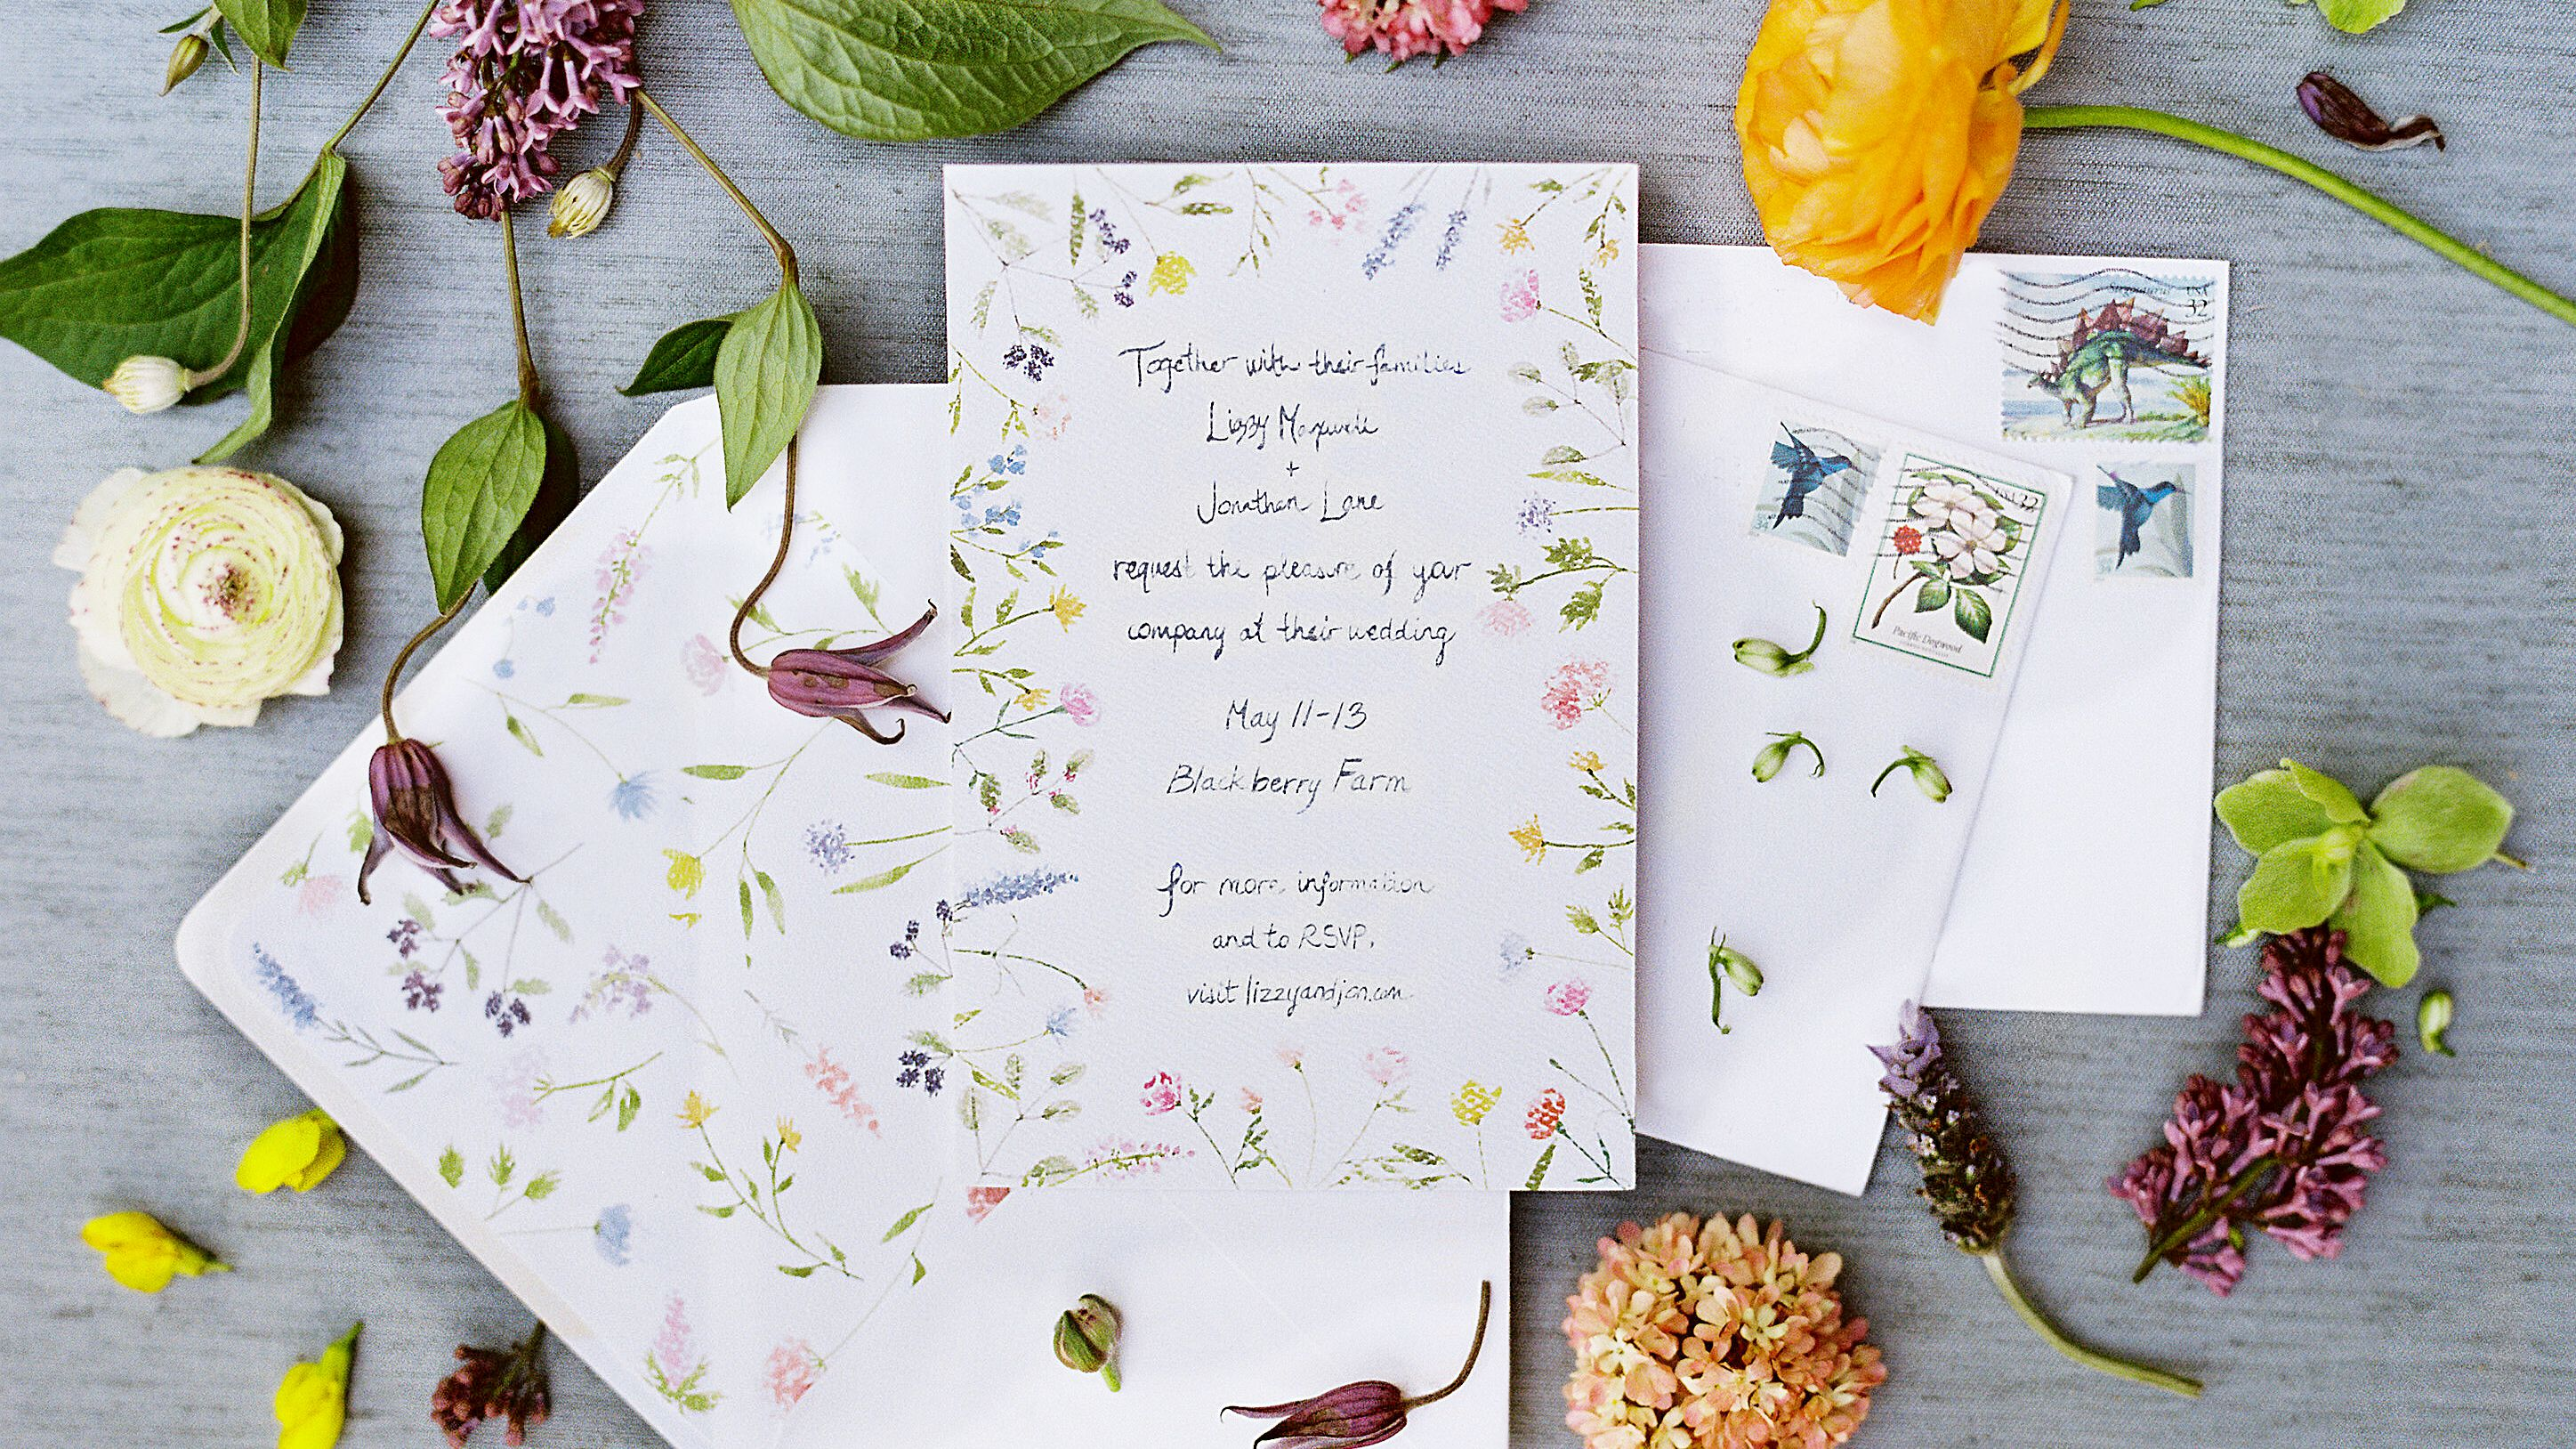 27 Unique Wedding Invitation Ideas for Every Wedding Style